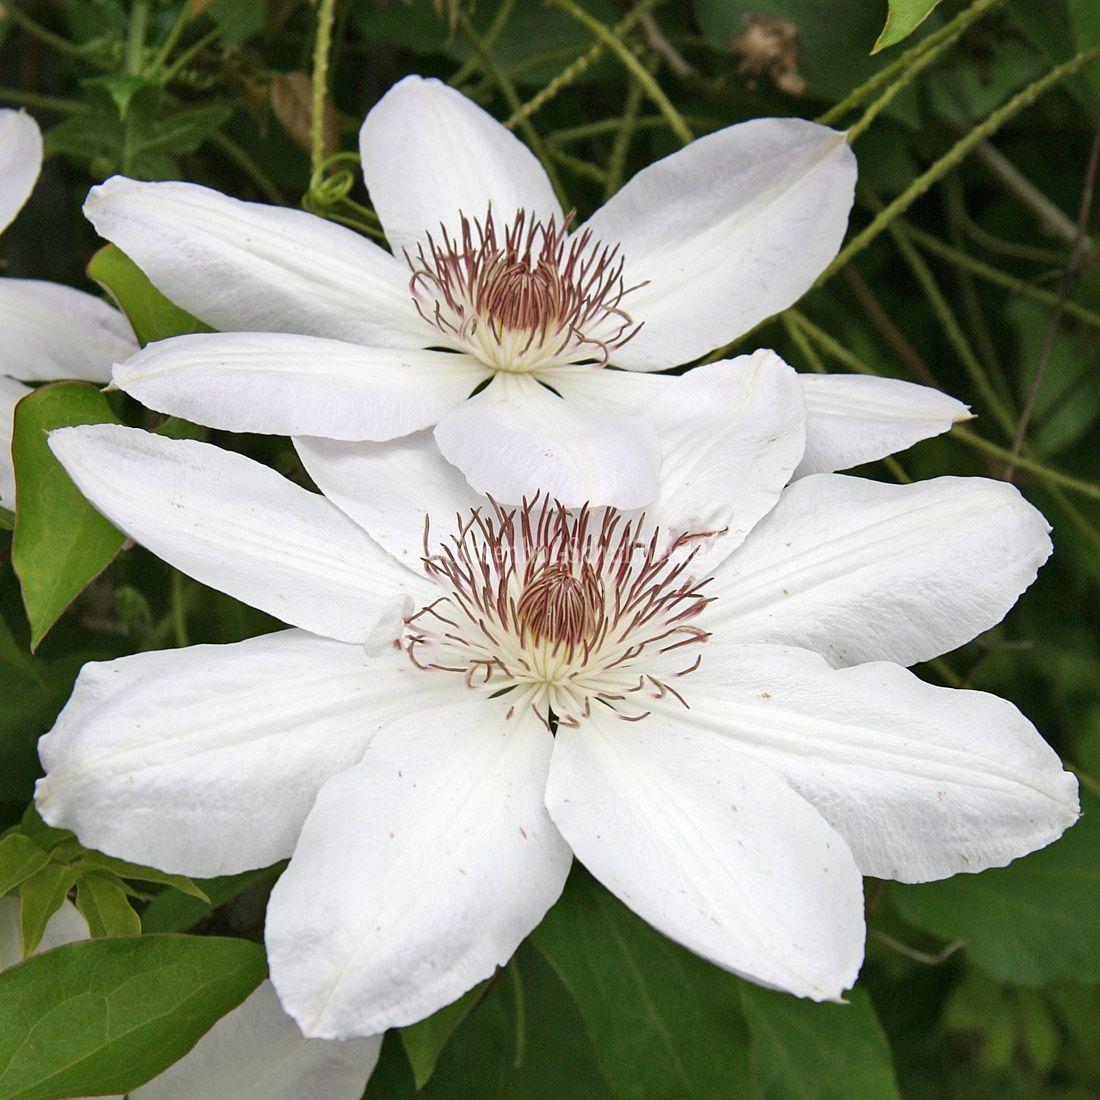 henryi rosen online kaufen im rosenhof schultheis rosen online kaufen im rosenhof schultheis. Black Bedroom Furniture Sets. Home Design Ideas